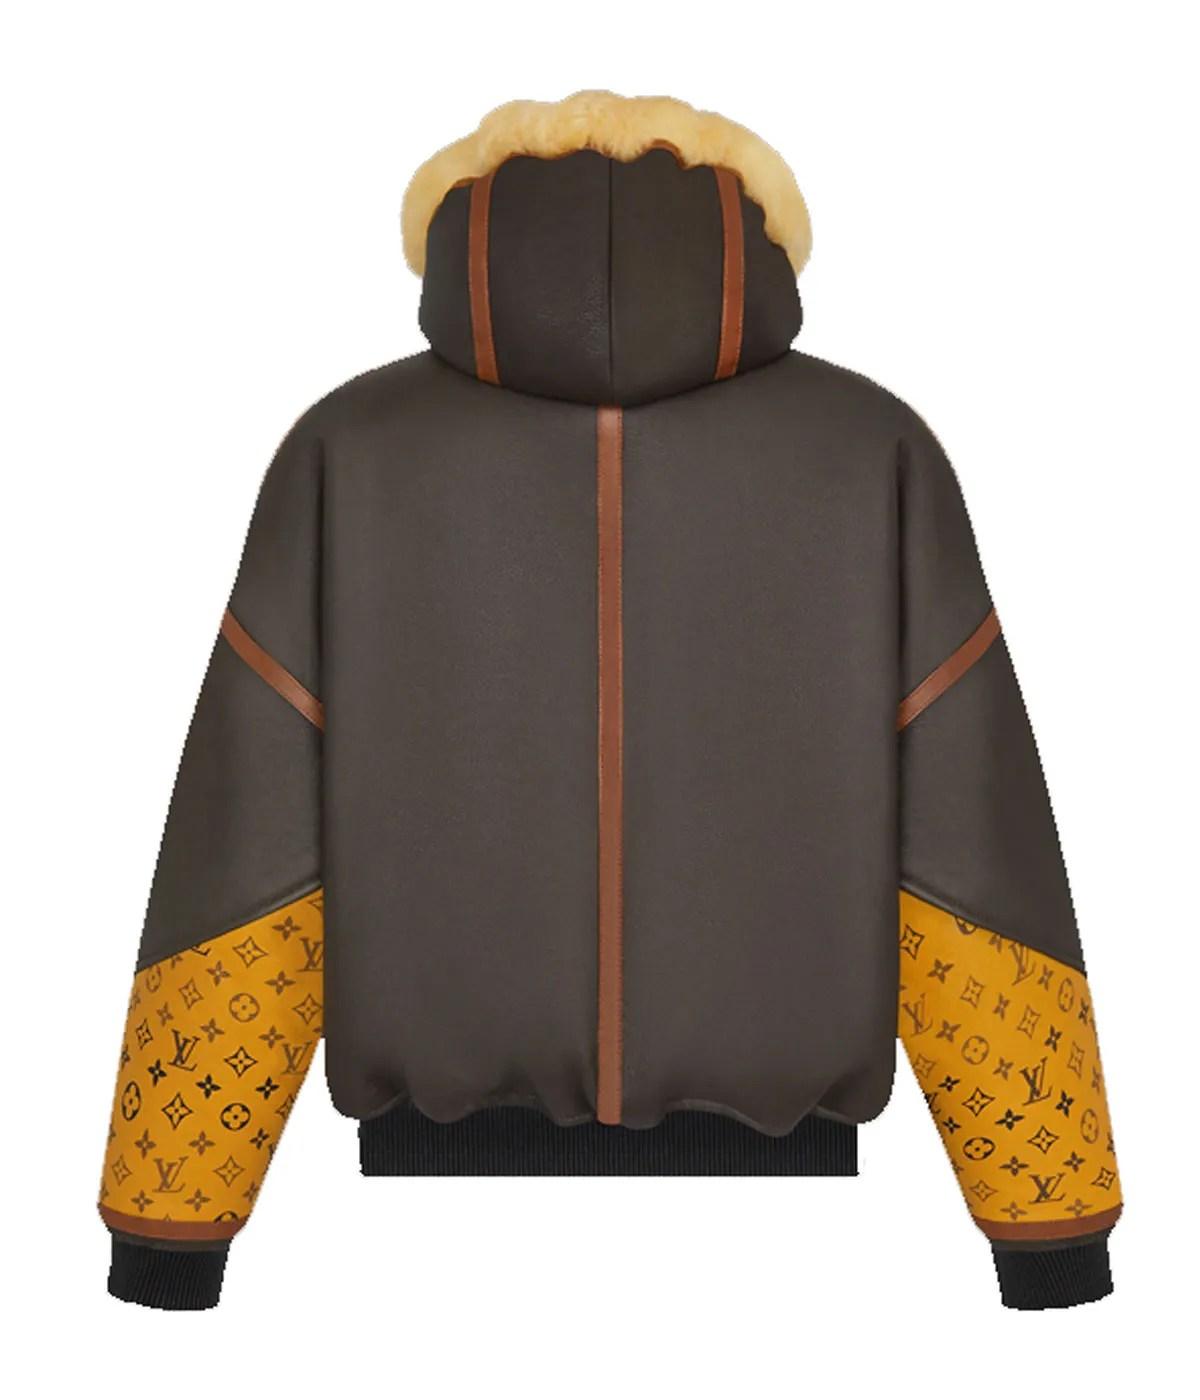 blige-aviator-monet-shearling-leather-jacket